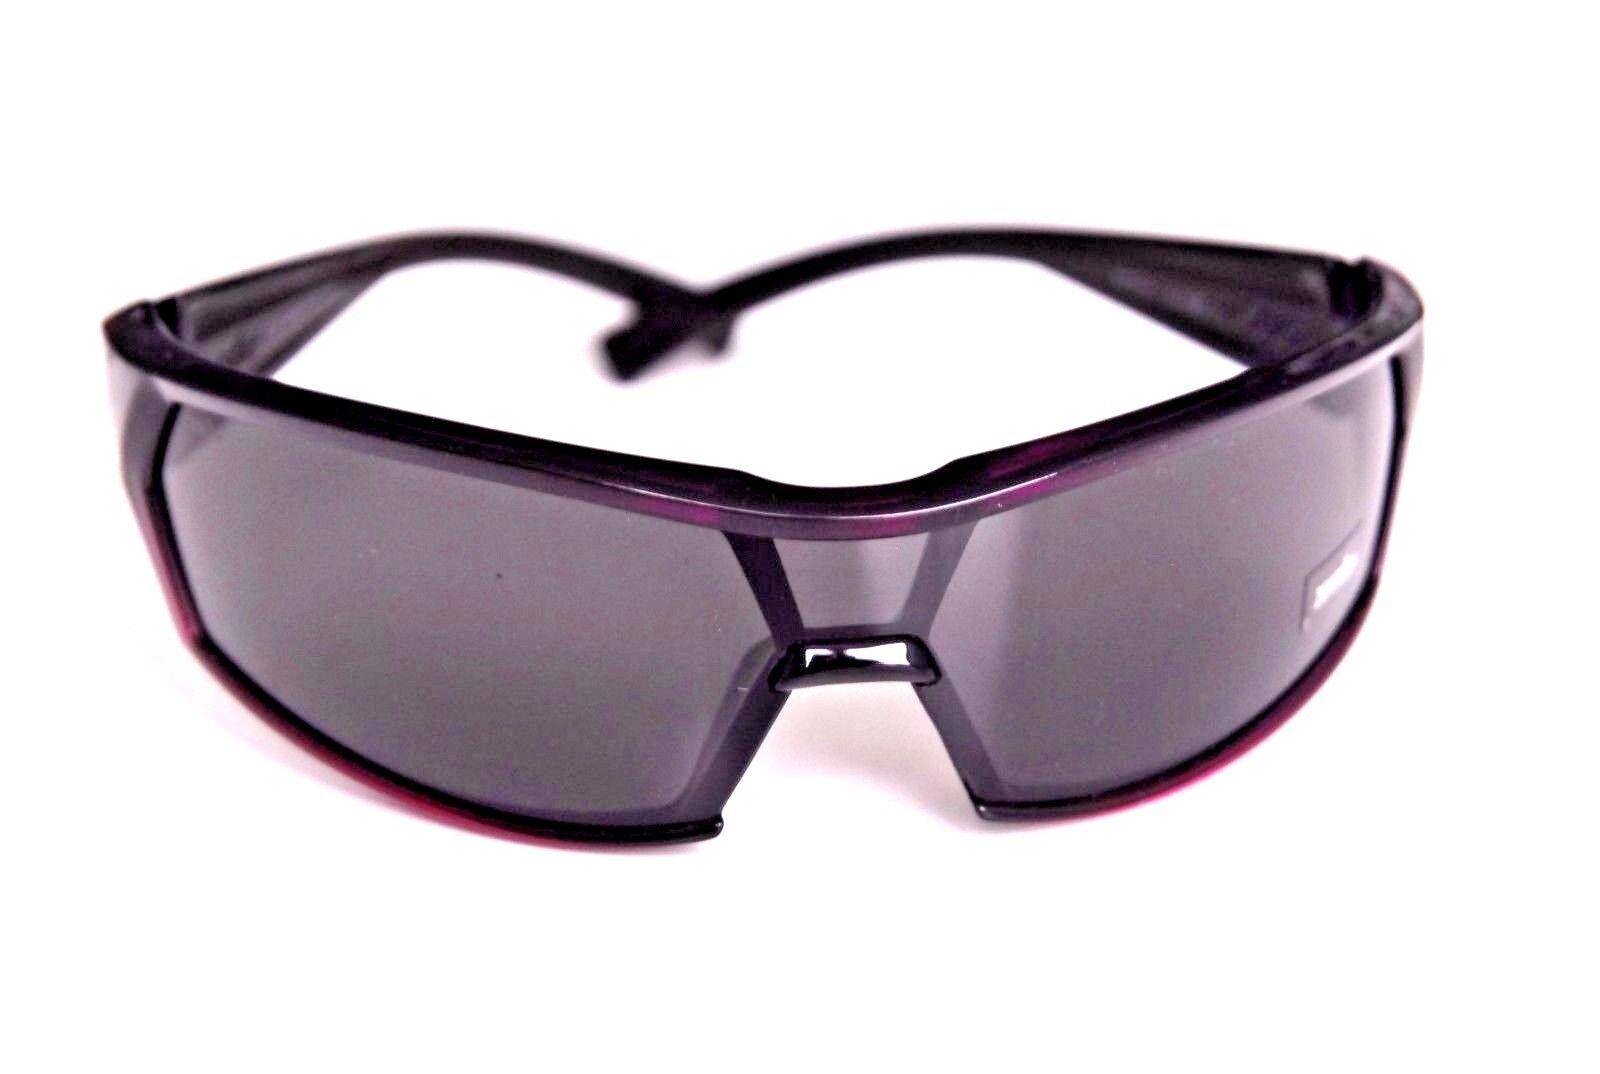 Cycling Sky Sunglasses Zero RH+  ZeroRh+. Model RH70204 LOGO. Nuovo